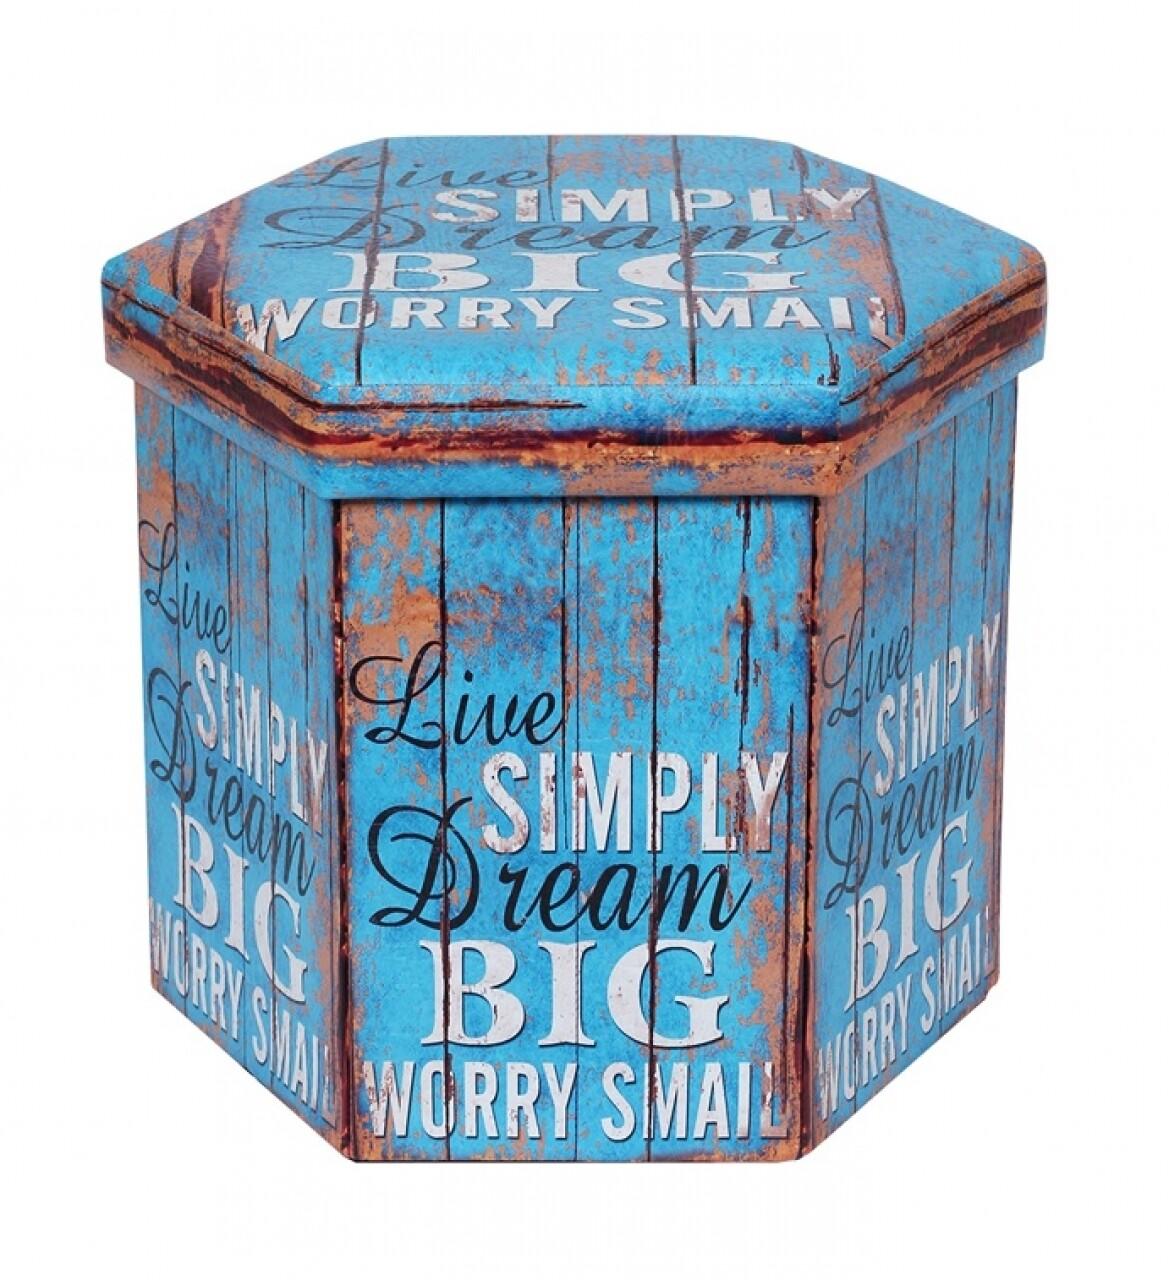 Taburet pliabil cu spatiu de depozitare Dream, Heinner Home, 38 x 38 x 43 cm, PVC, albastru